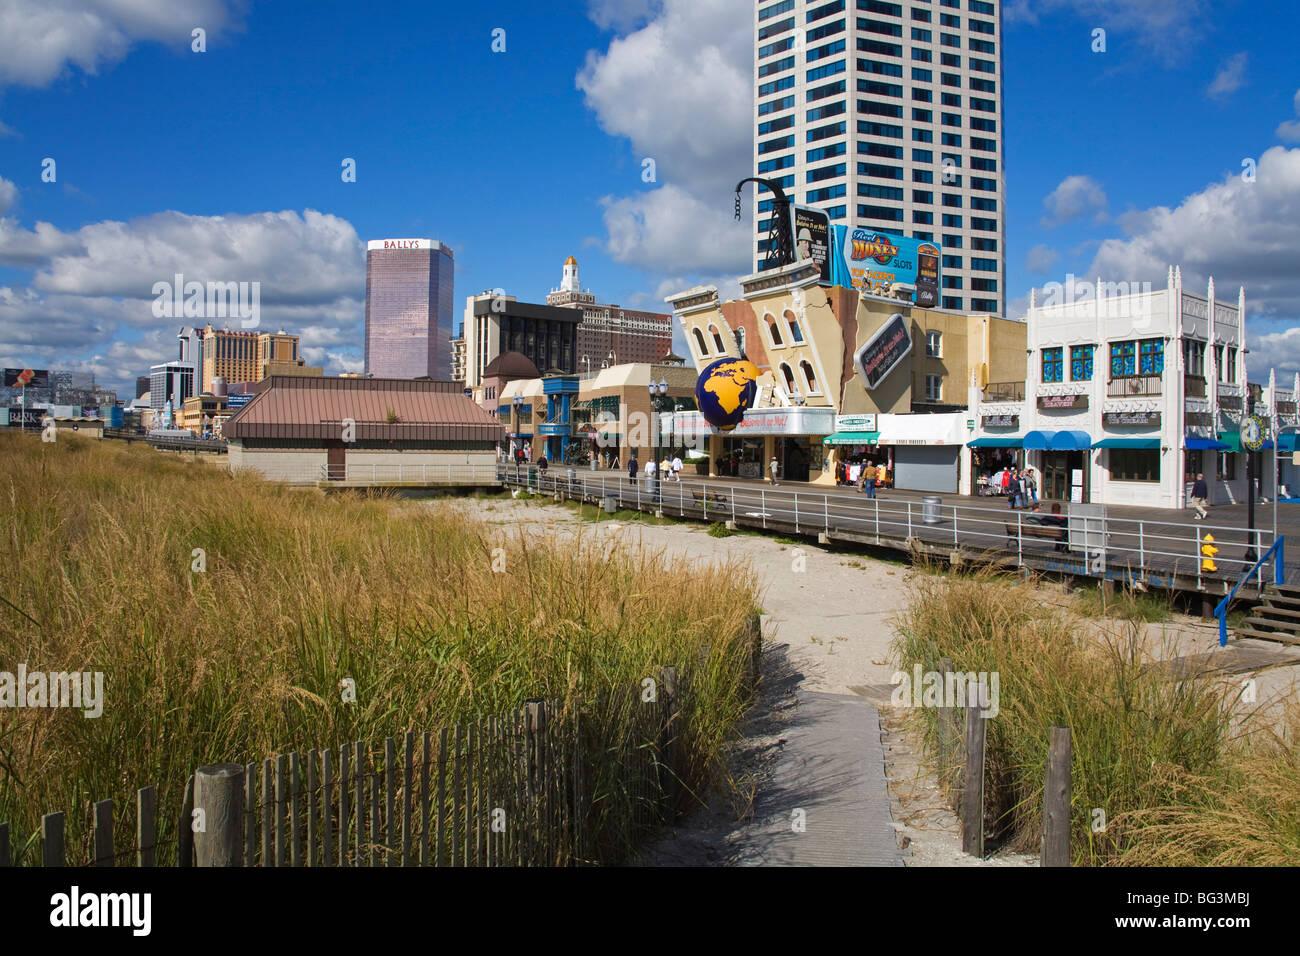 Atlantic City Boardwalk, Atlantic City, New Jersey, United States of America, North America - Stock Image